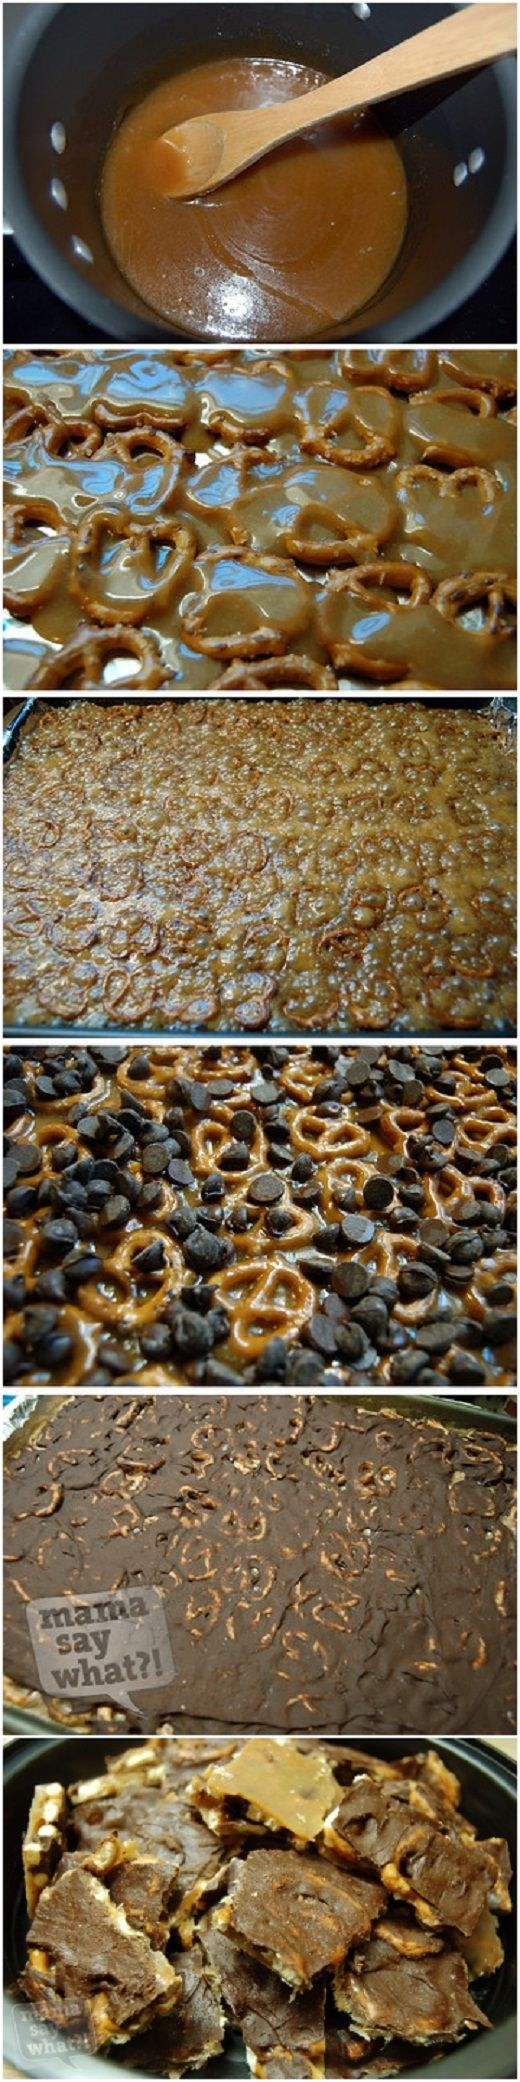 Salted Caramel Pretzel Bark ½ bag of mini pretzel twists  2 sticks of butter (1 cup total)  1 cup of brown sugar  1 bag of chocolate chips (2 cups)  Sea salt or table salt